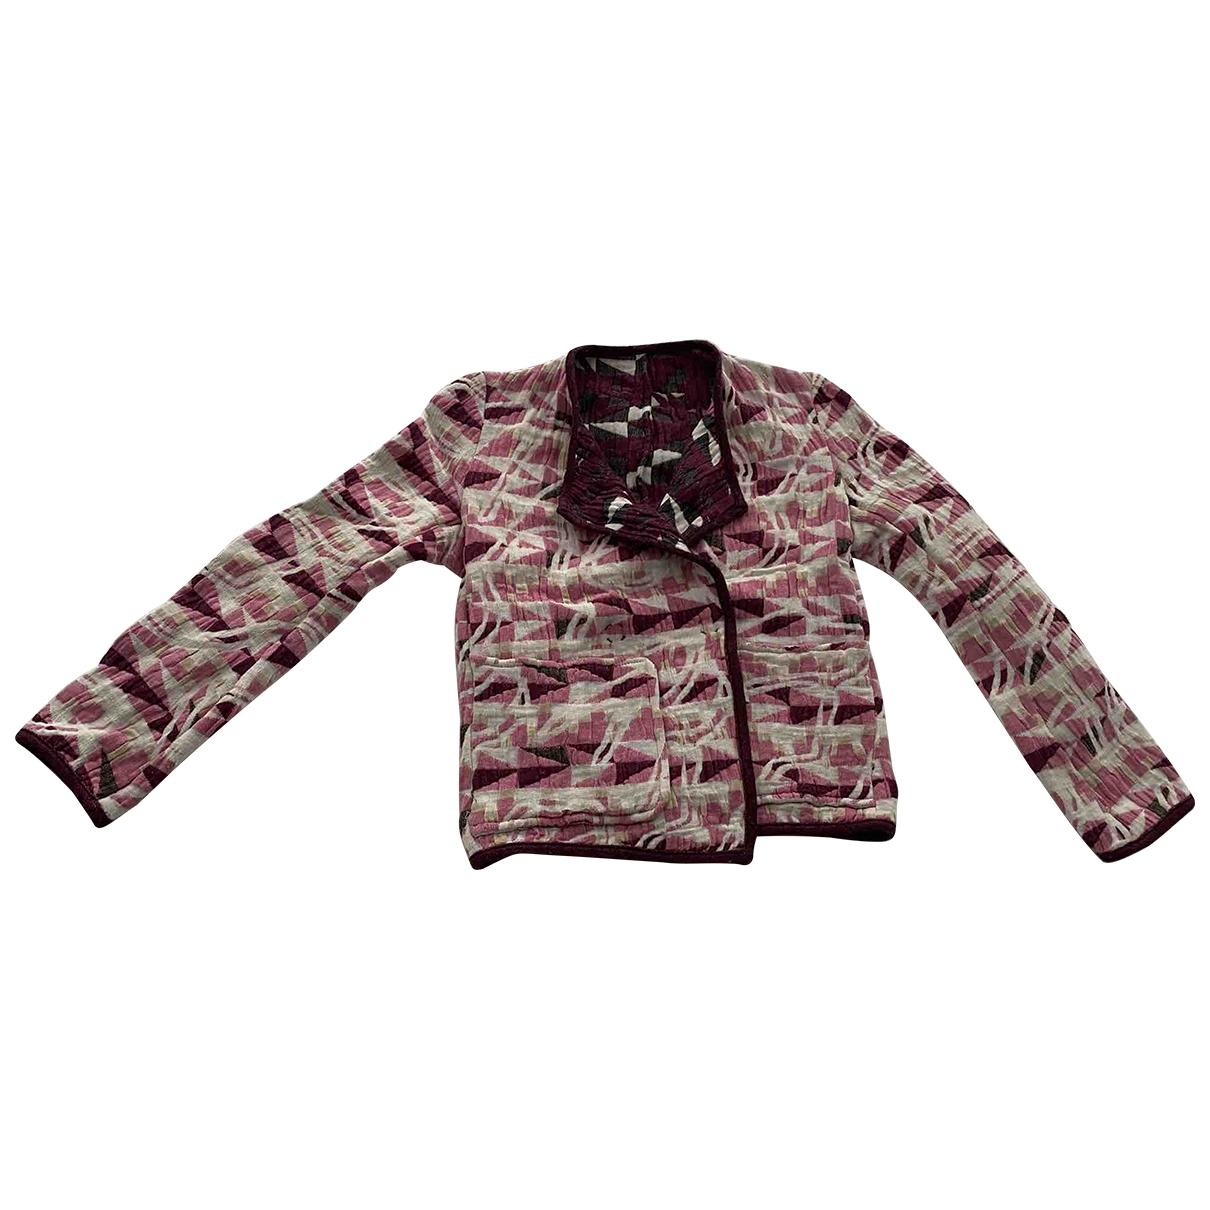 Maje \N Pink Cotton jacket for Women 36 FR